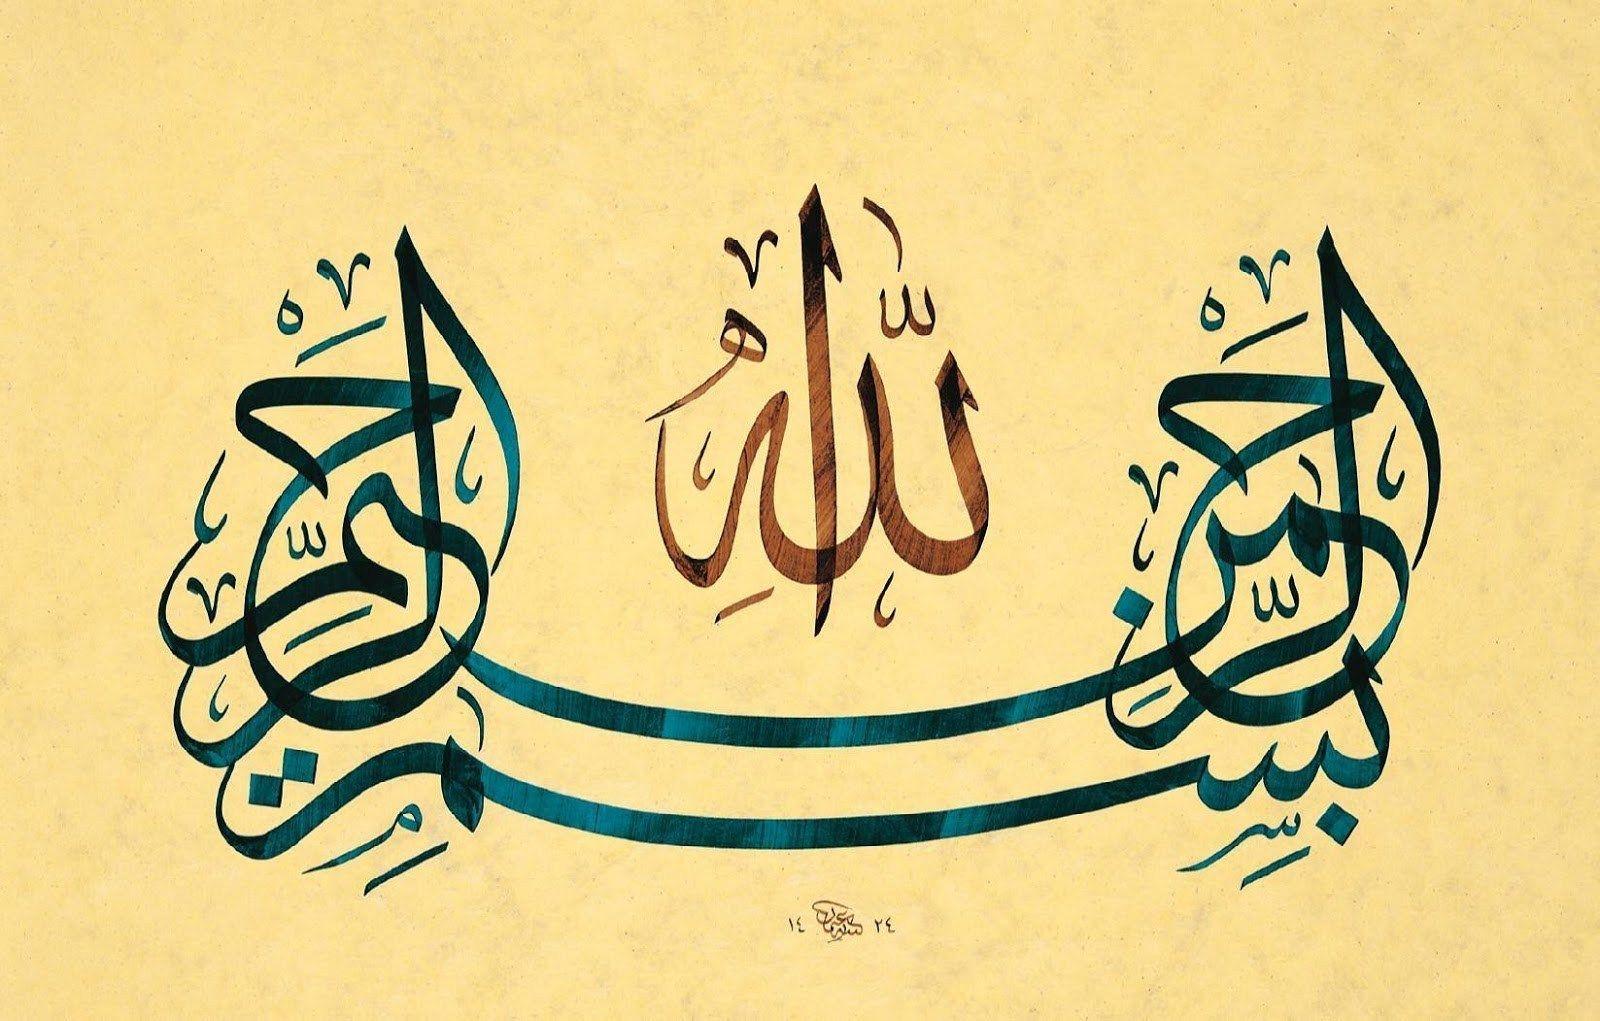 20 Sfat Allah Kaligrafi Arab Kaligrafi Kaligrafi Islam